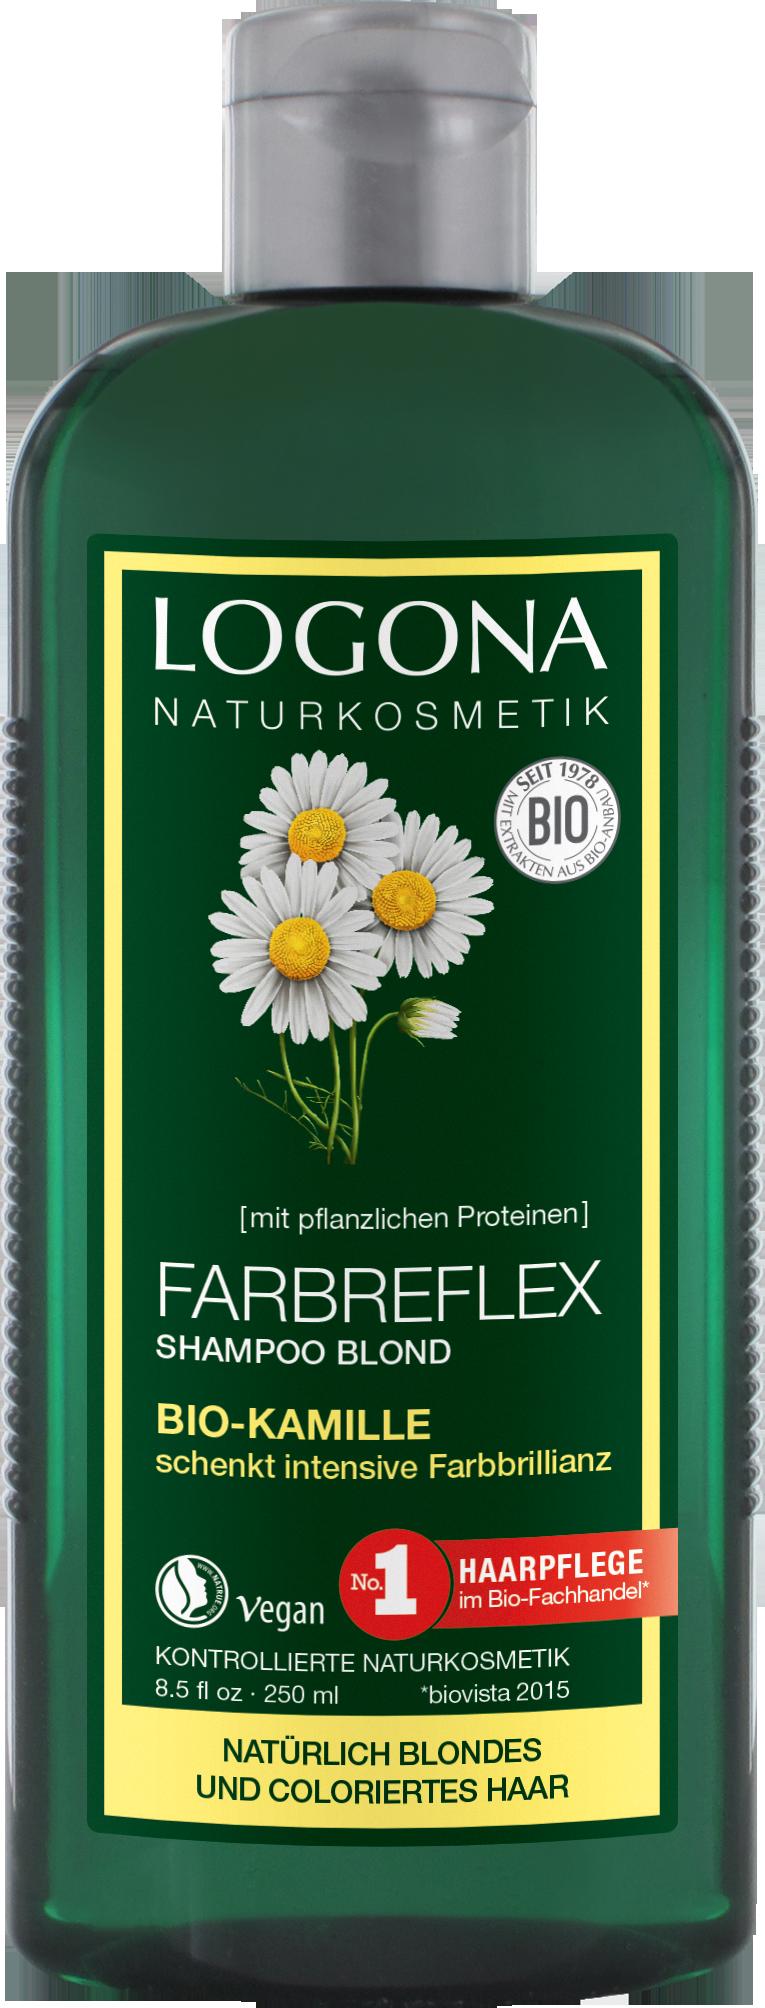 farbreflex shampoo blond bio kamille logona naturkosmetik. Black Bedroom Furniture Sets. Home Design Ideas